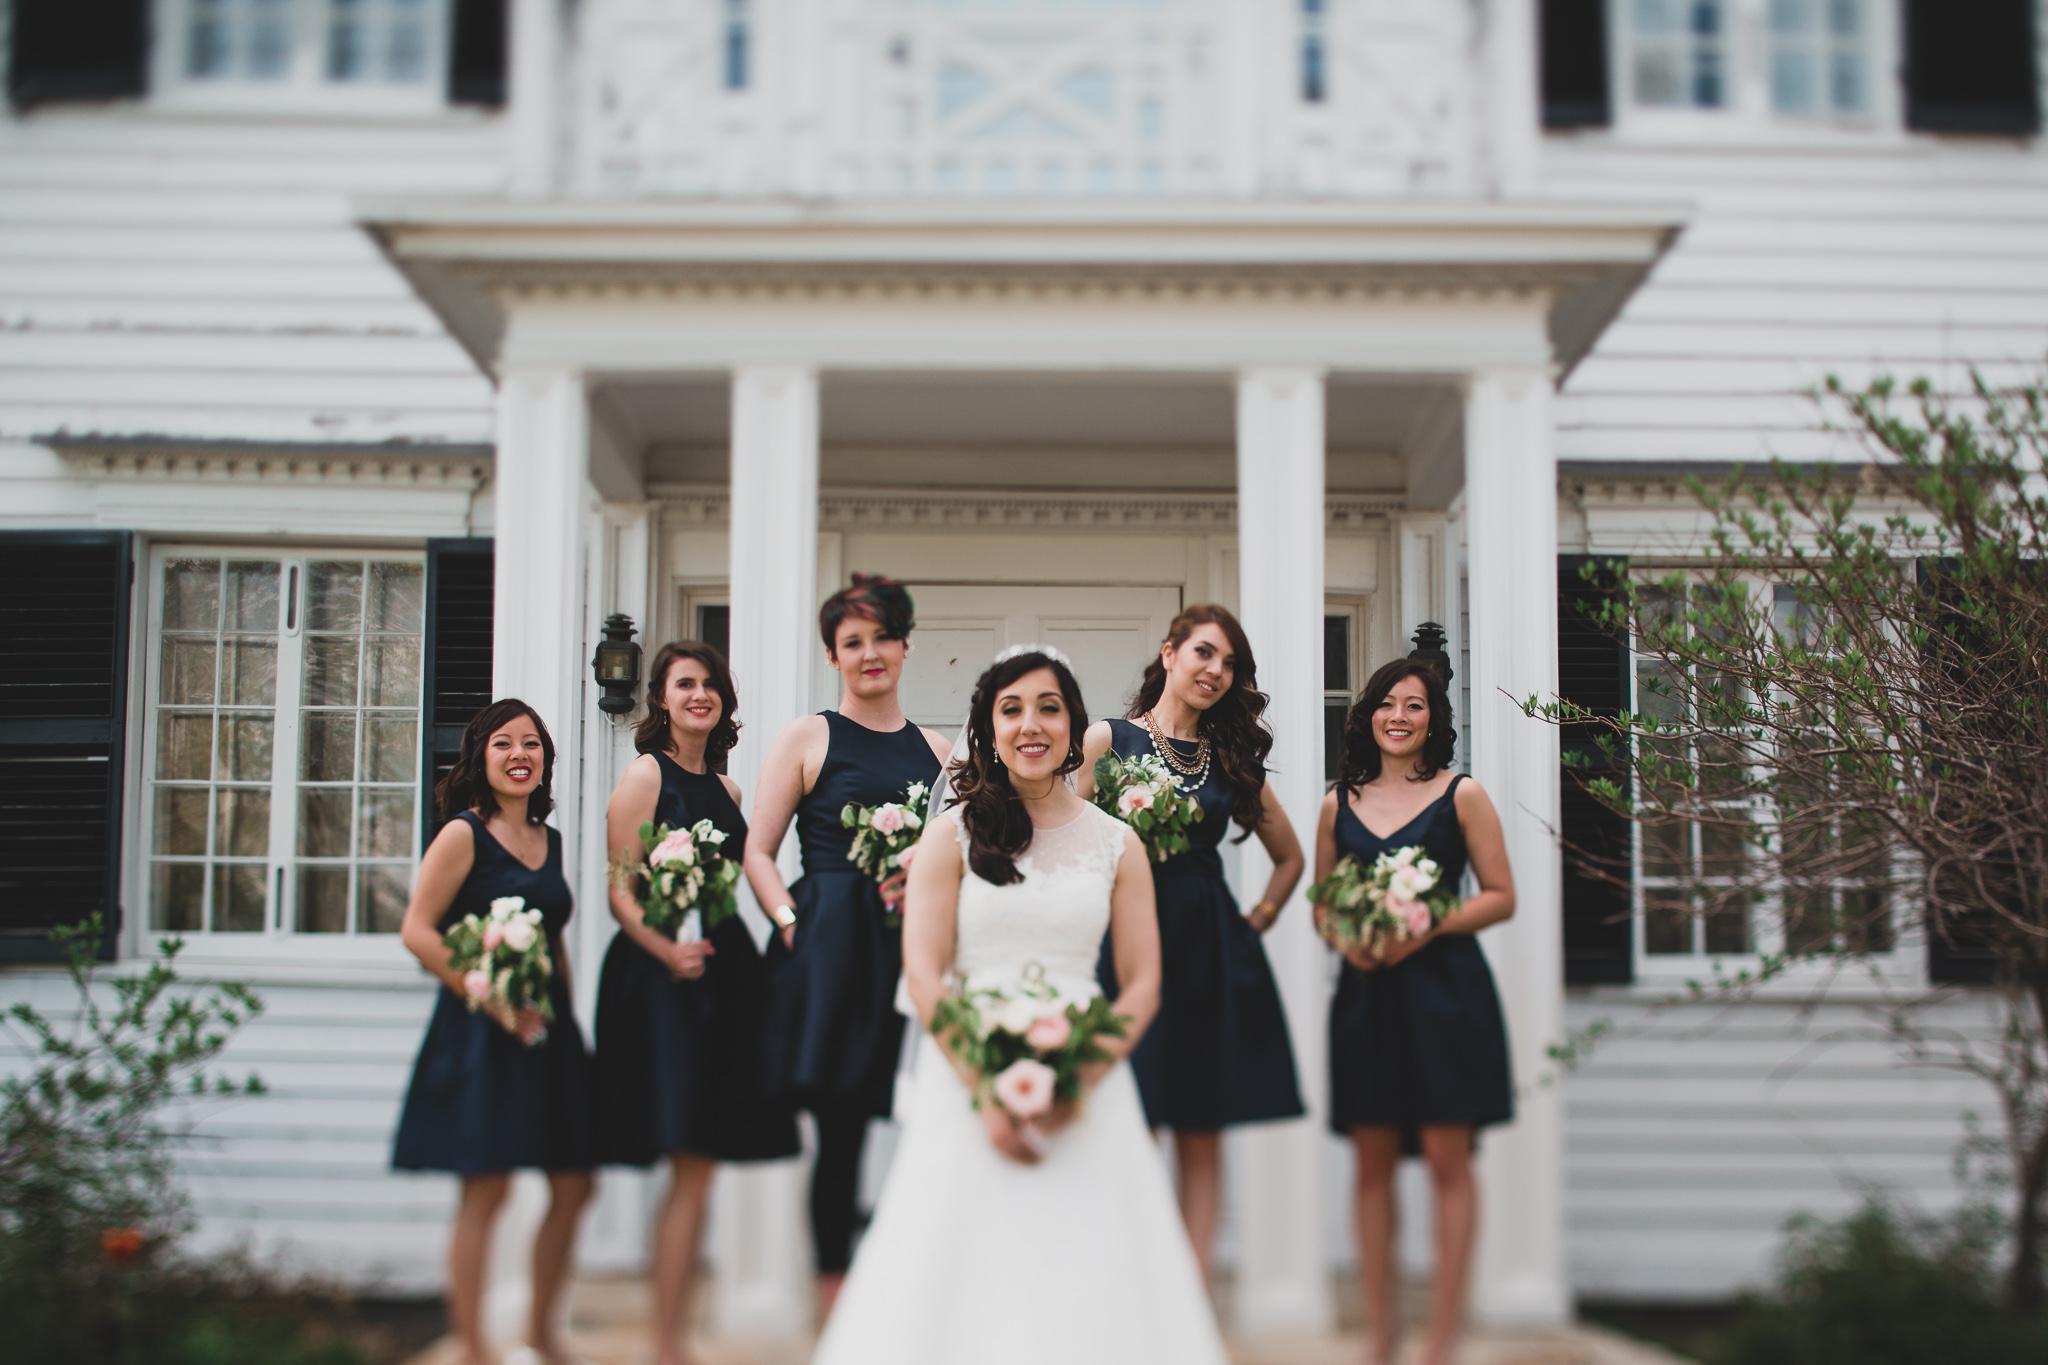 Perth and Kingston Wedding Photographer